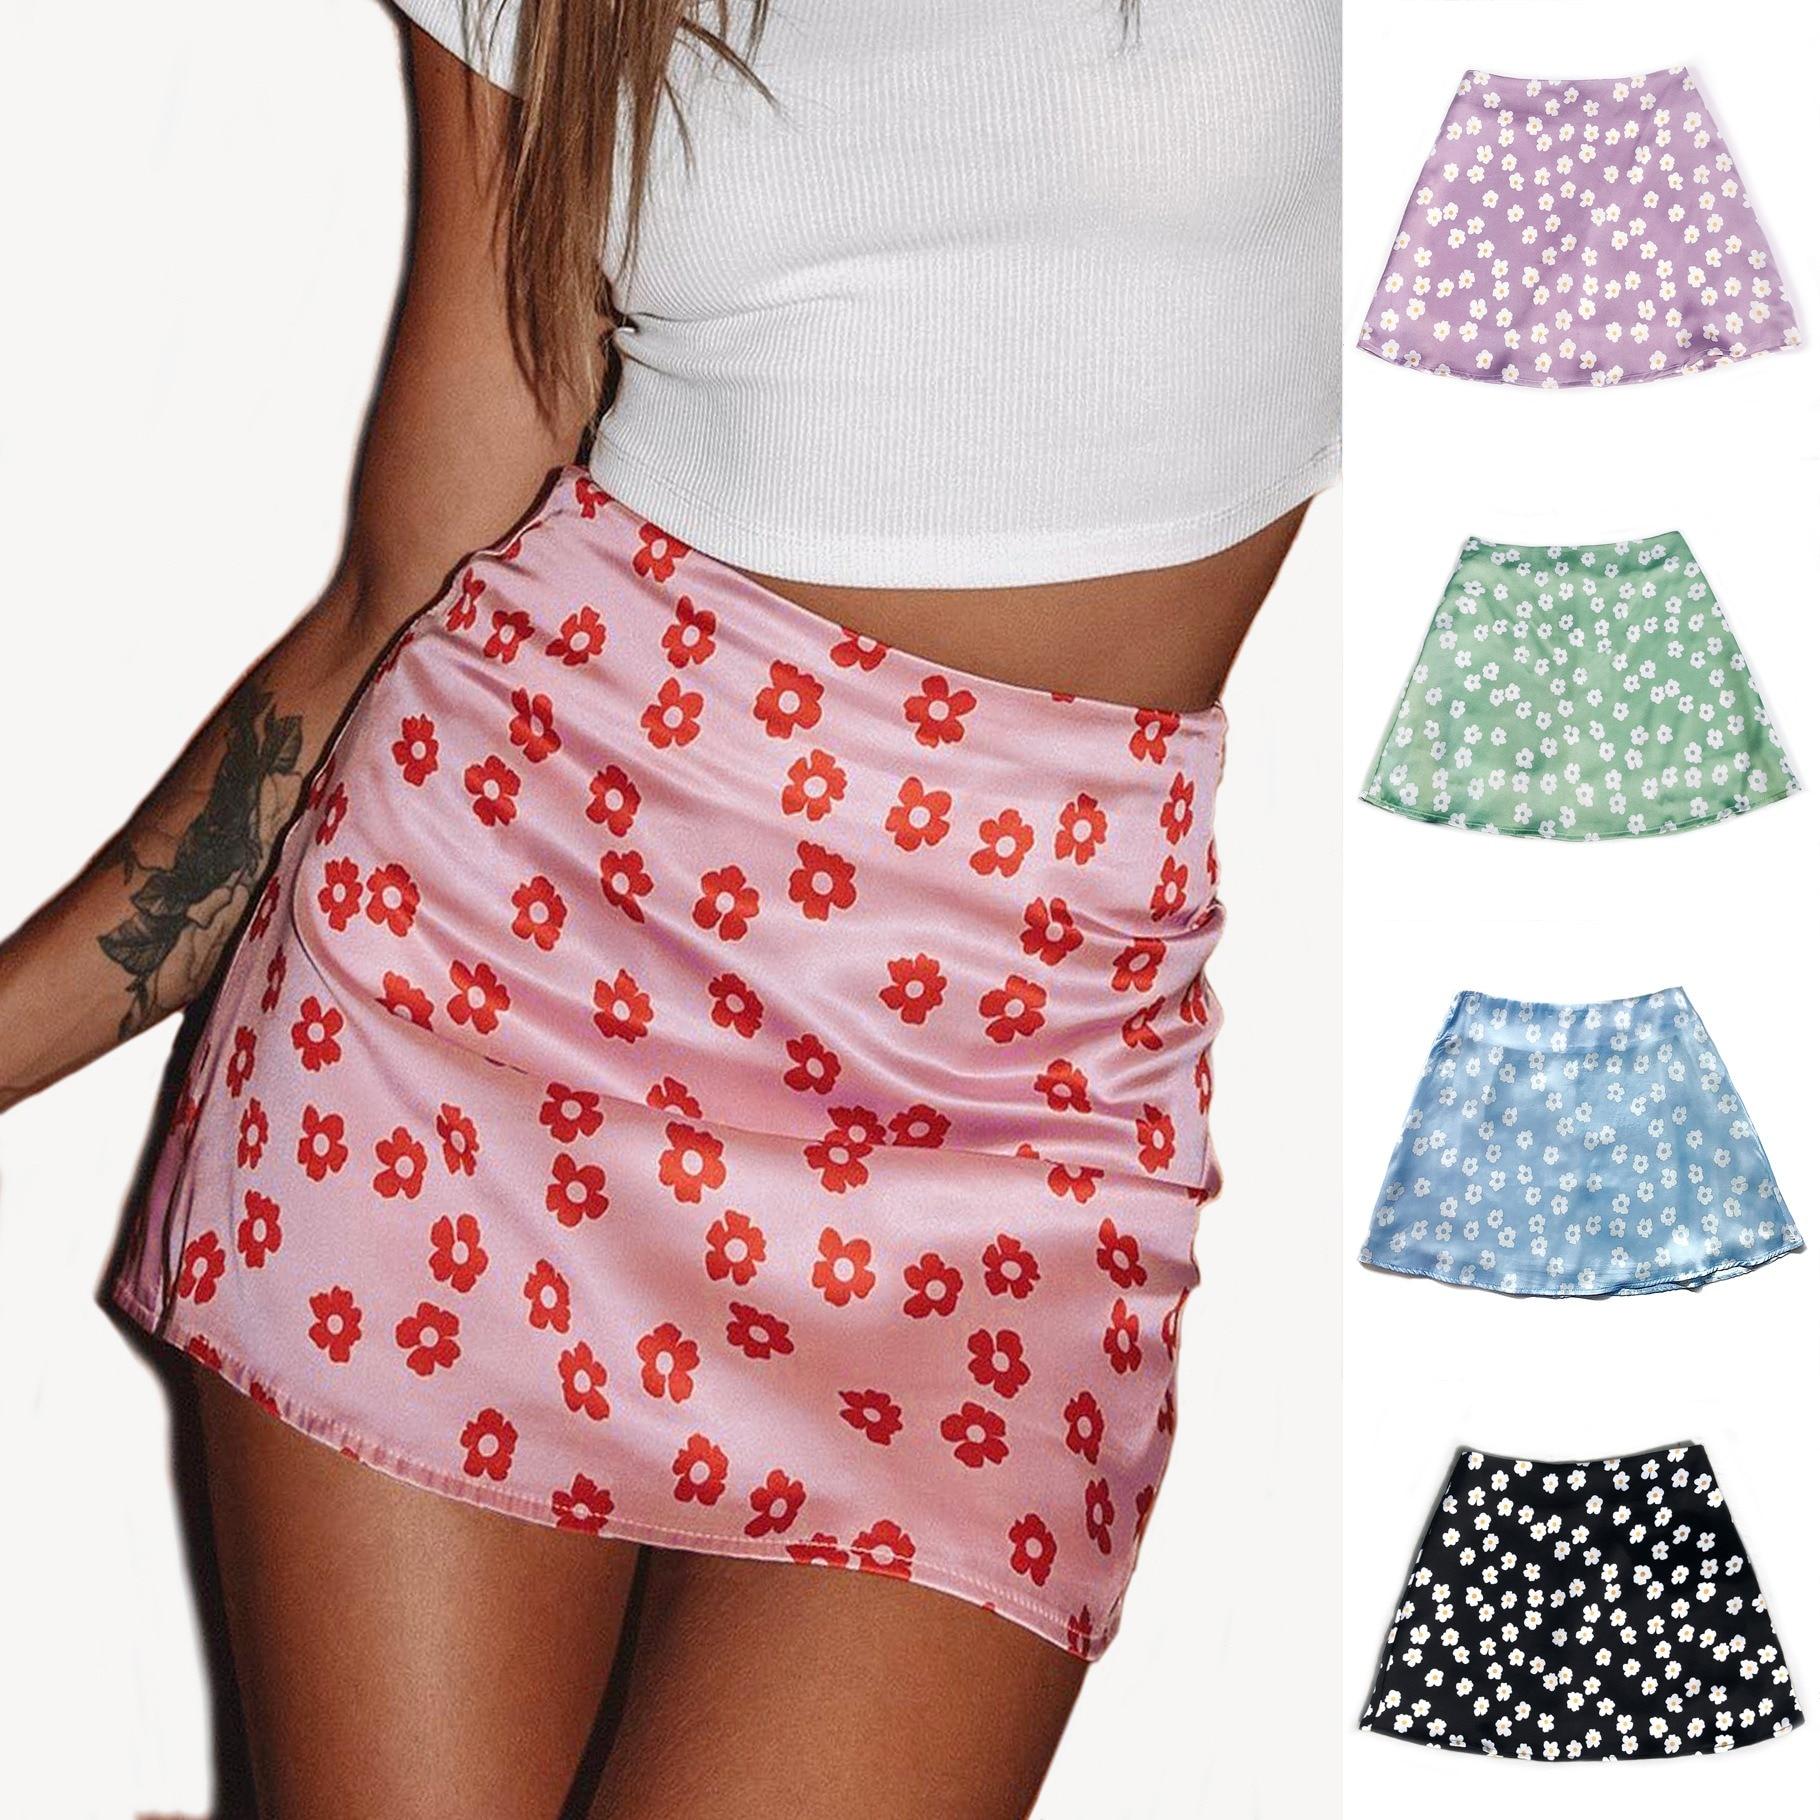 Women's 2021 Summer High Waist Satin Printed Short Skirt European and American Style Pink Flower Skirt